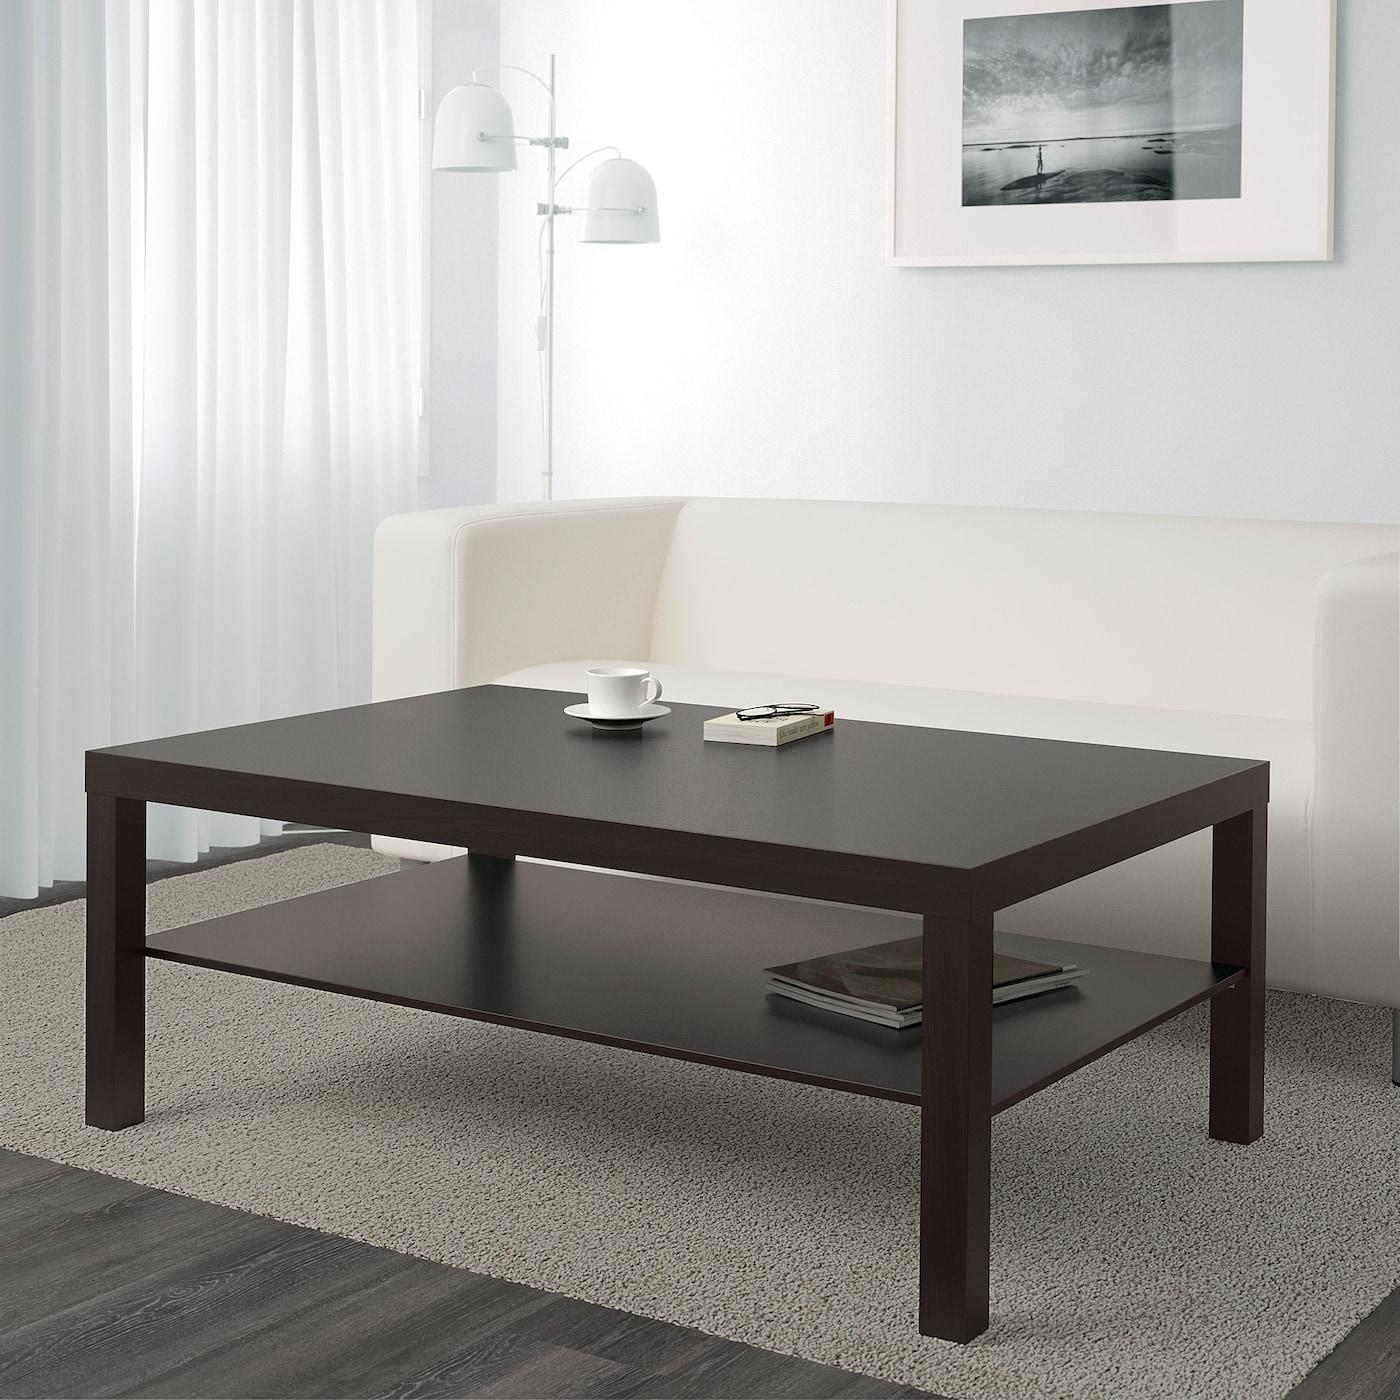 Lack Coffee Table Black Brown Ca Ikea [ 1400 x 1400 Pixel ]